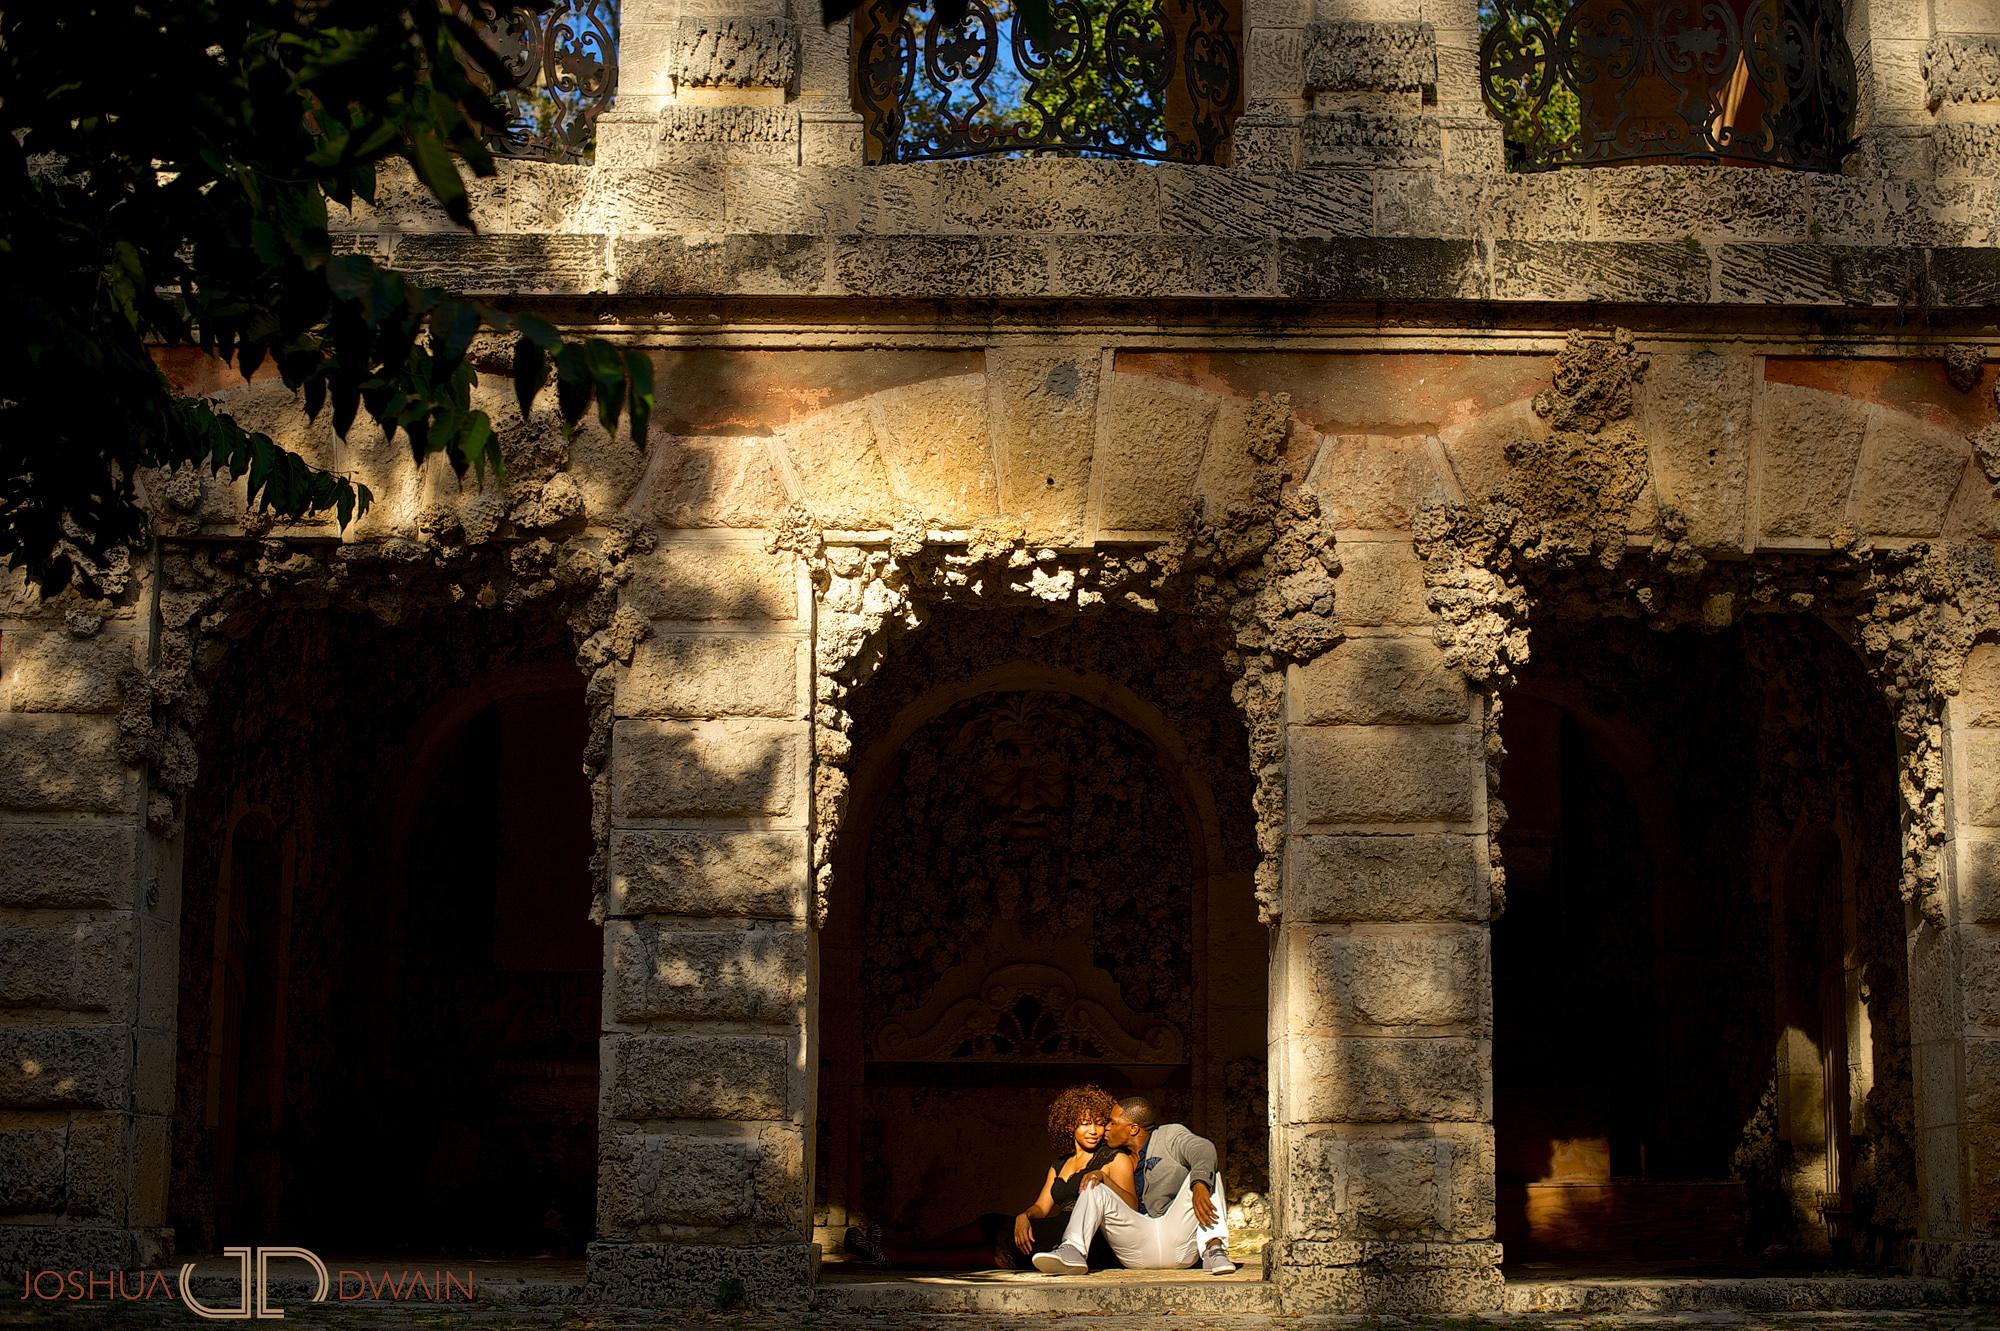 danielle-dowani-004-vizcaya-museum-gardens-miami-florida-wedding-photographer-joshua-dwain